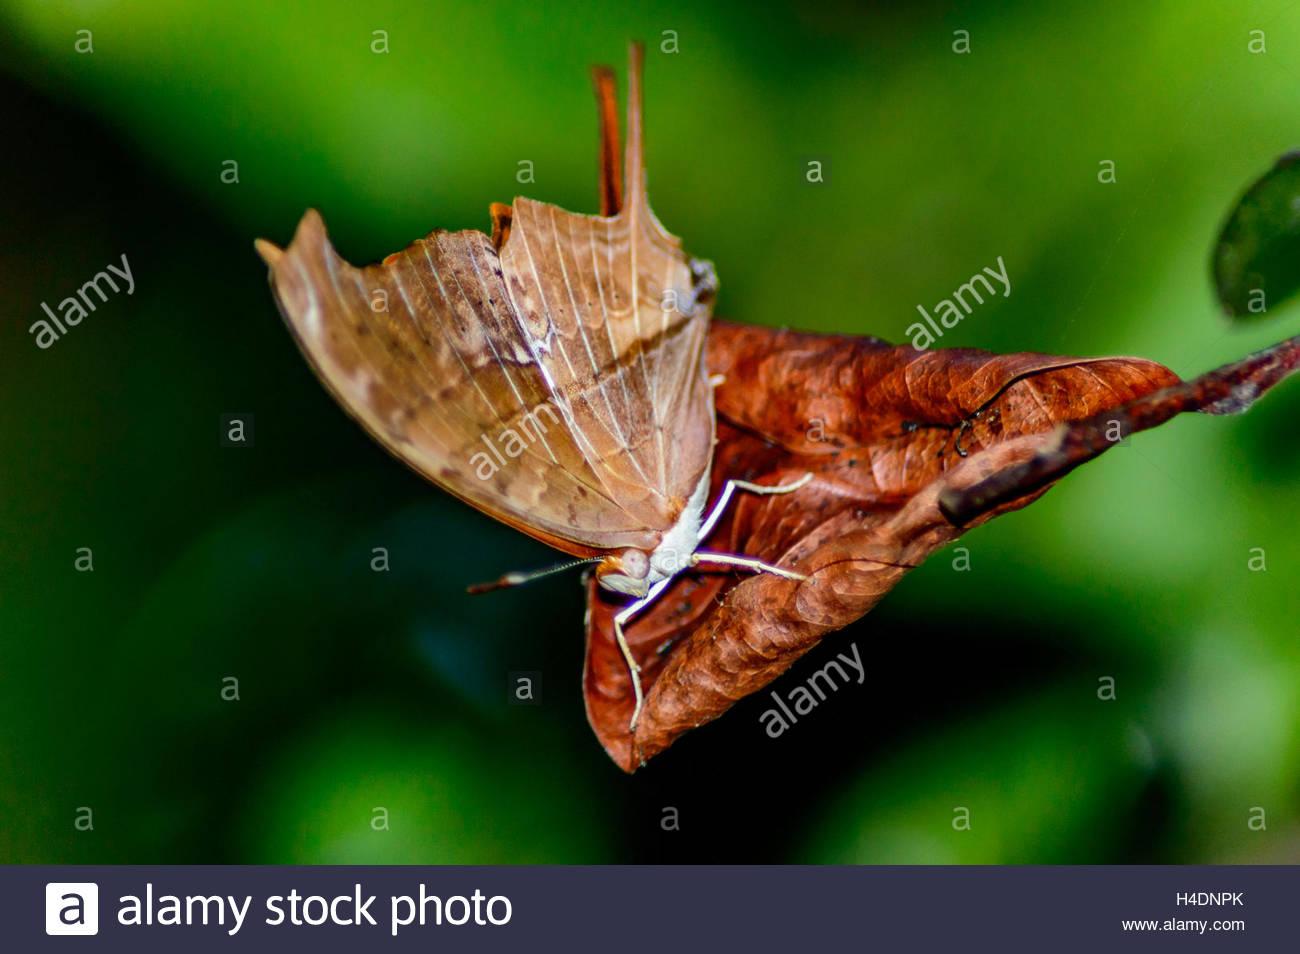 - Floridalis Leafwing Anaea Photo Stock